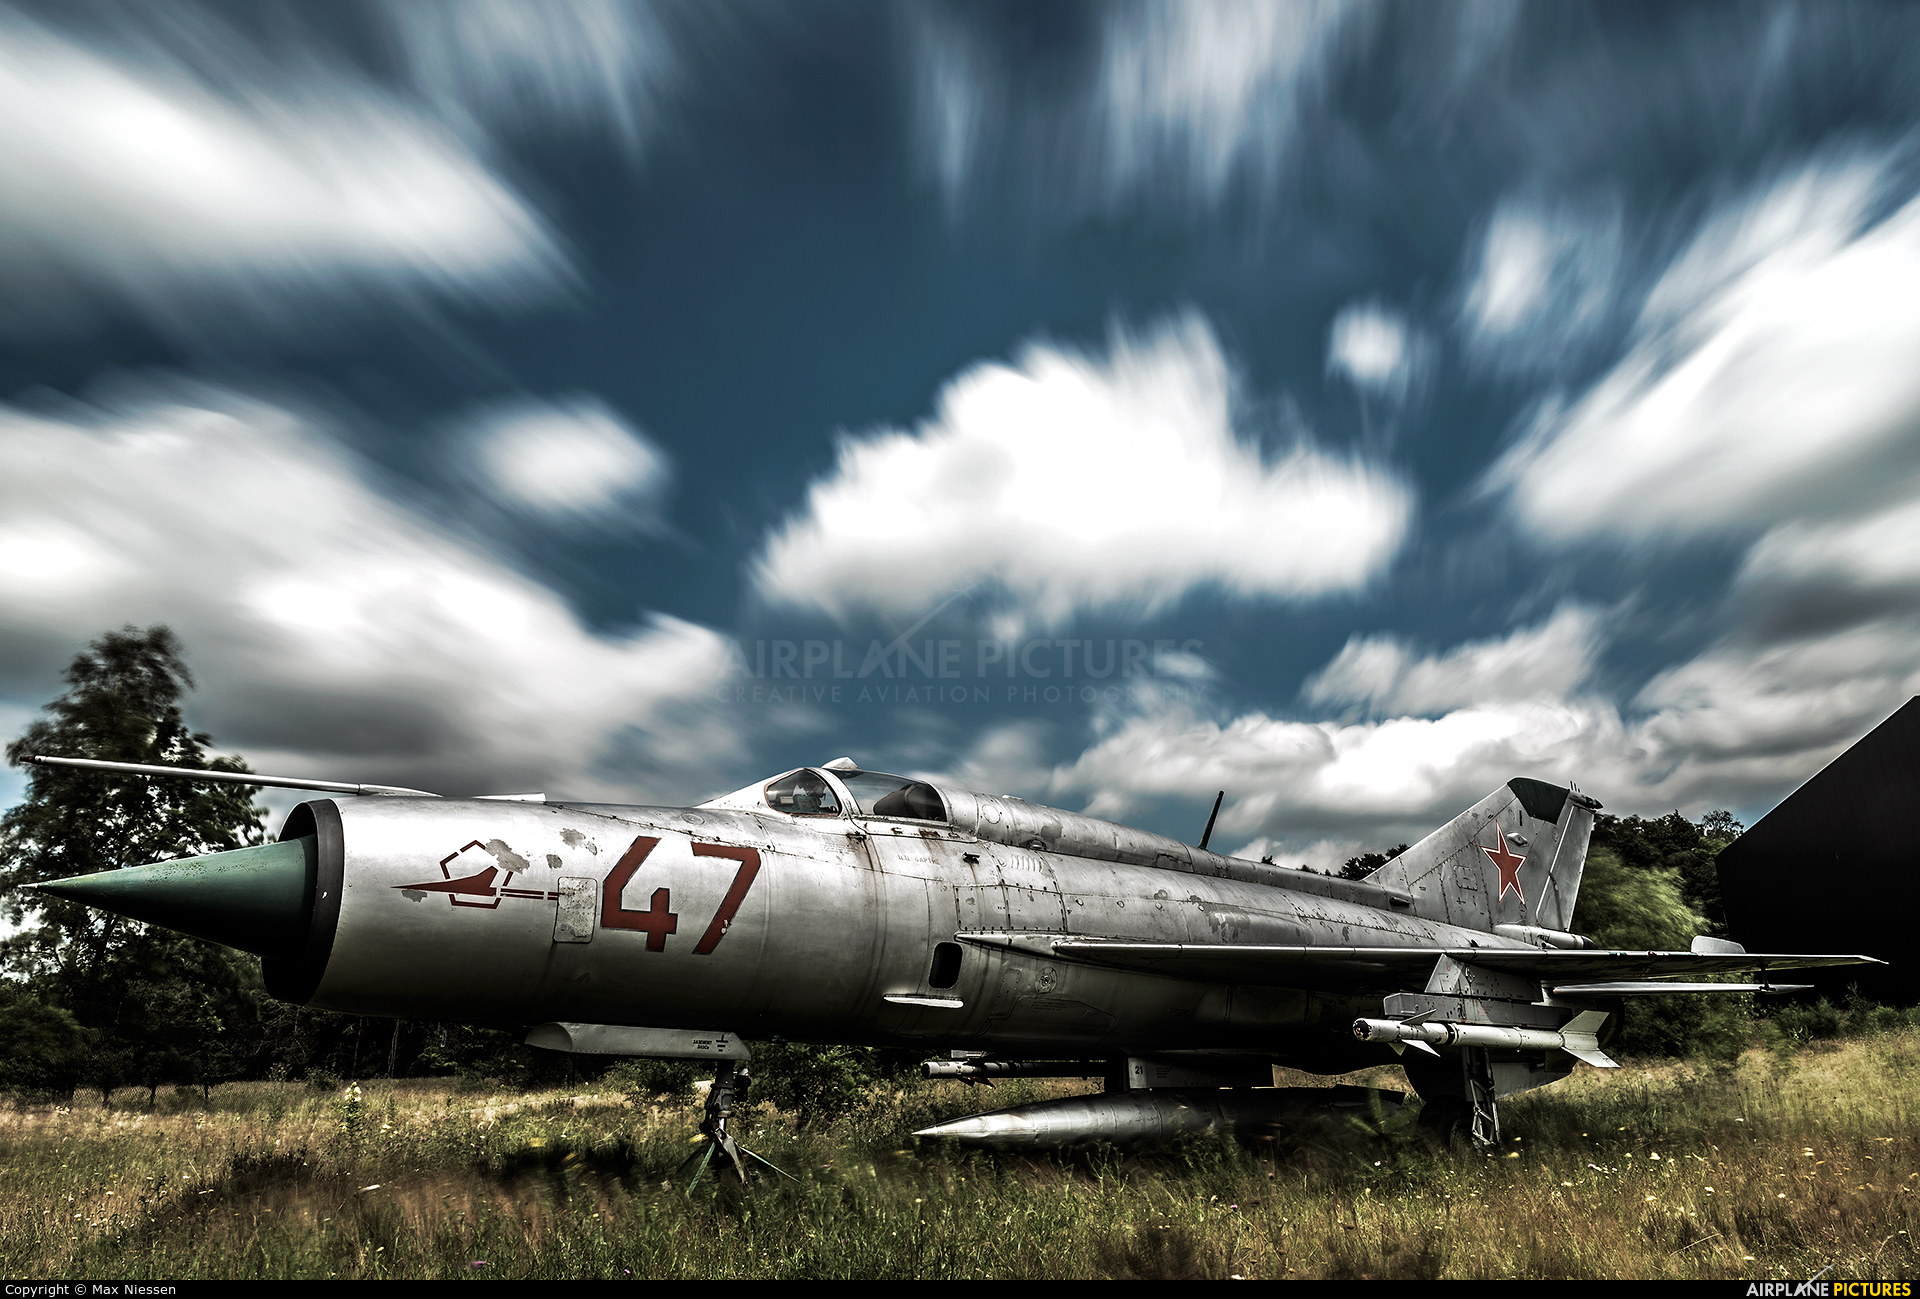 Russia - Air Force 47 aircraft at Soesterberg - Nationaal Militair Museum